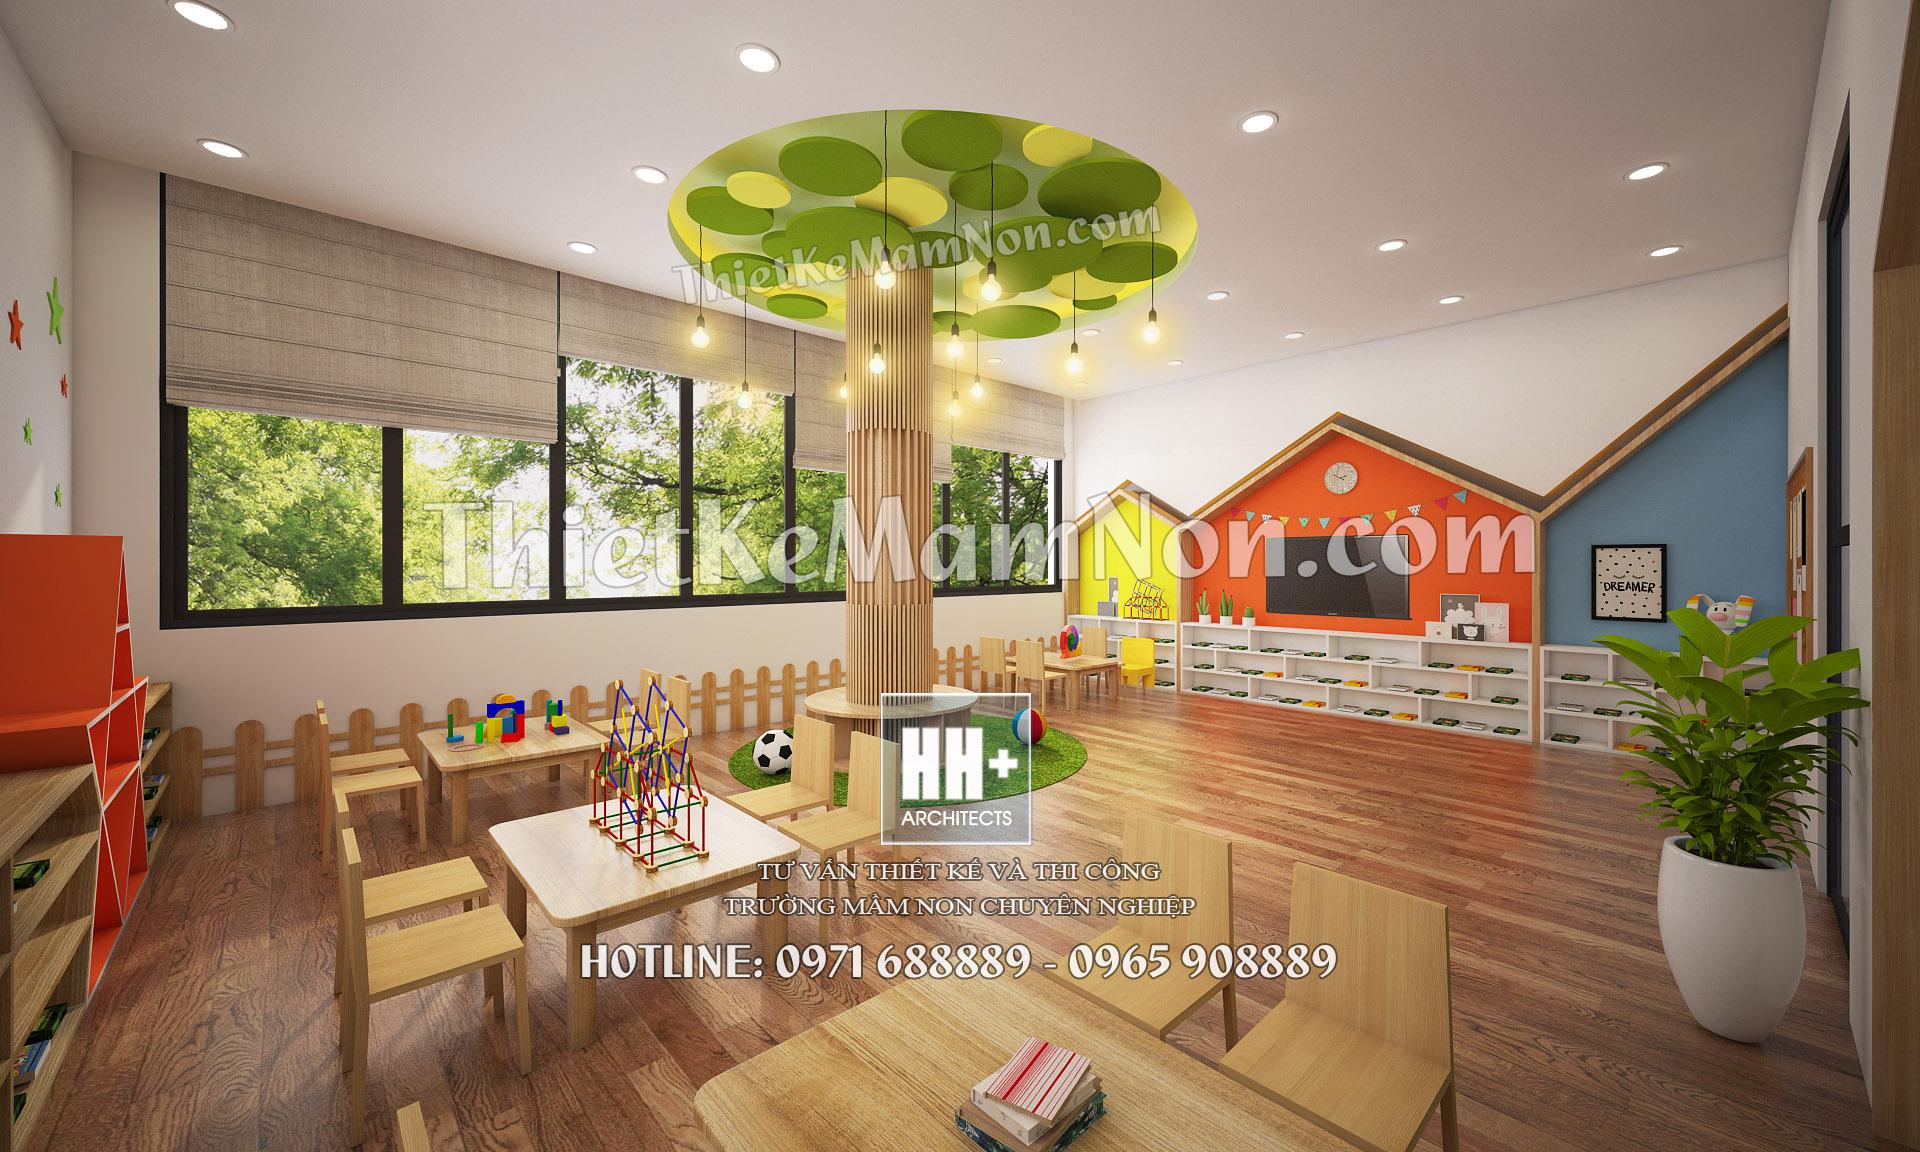 06 thiết kế nội thất mầm non Thiết kế nội thất mầm non quốc tế Việt Anh 06